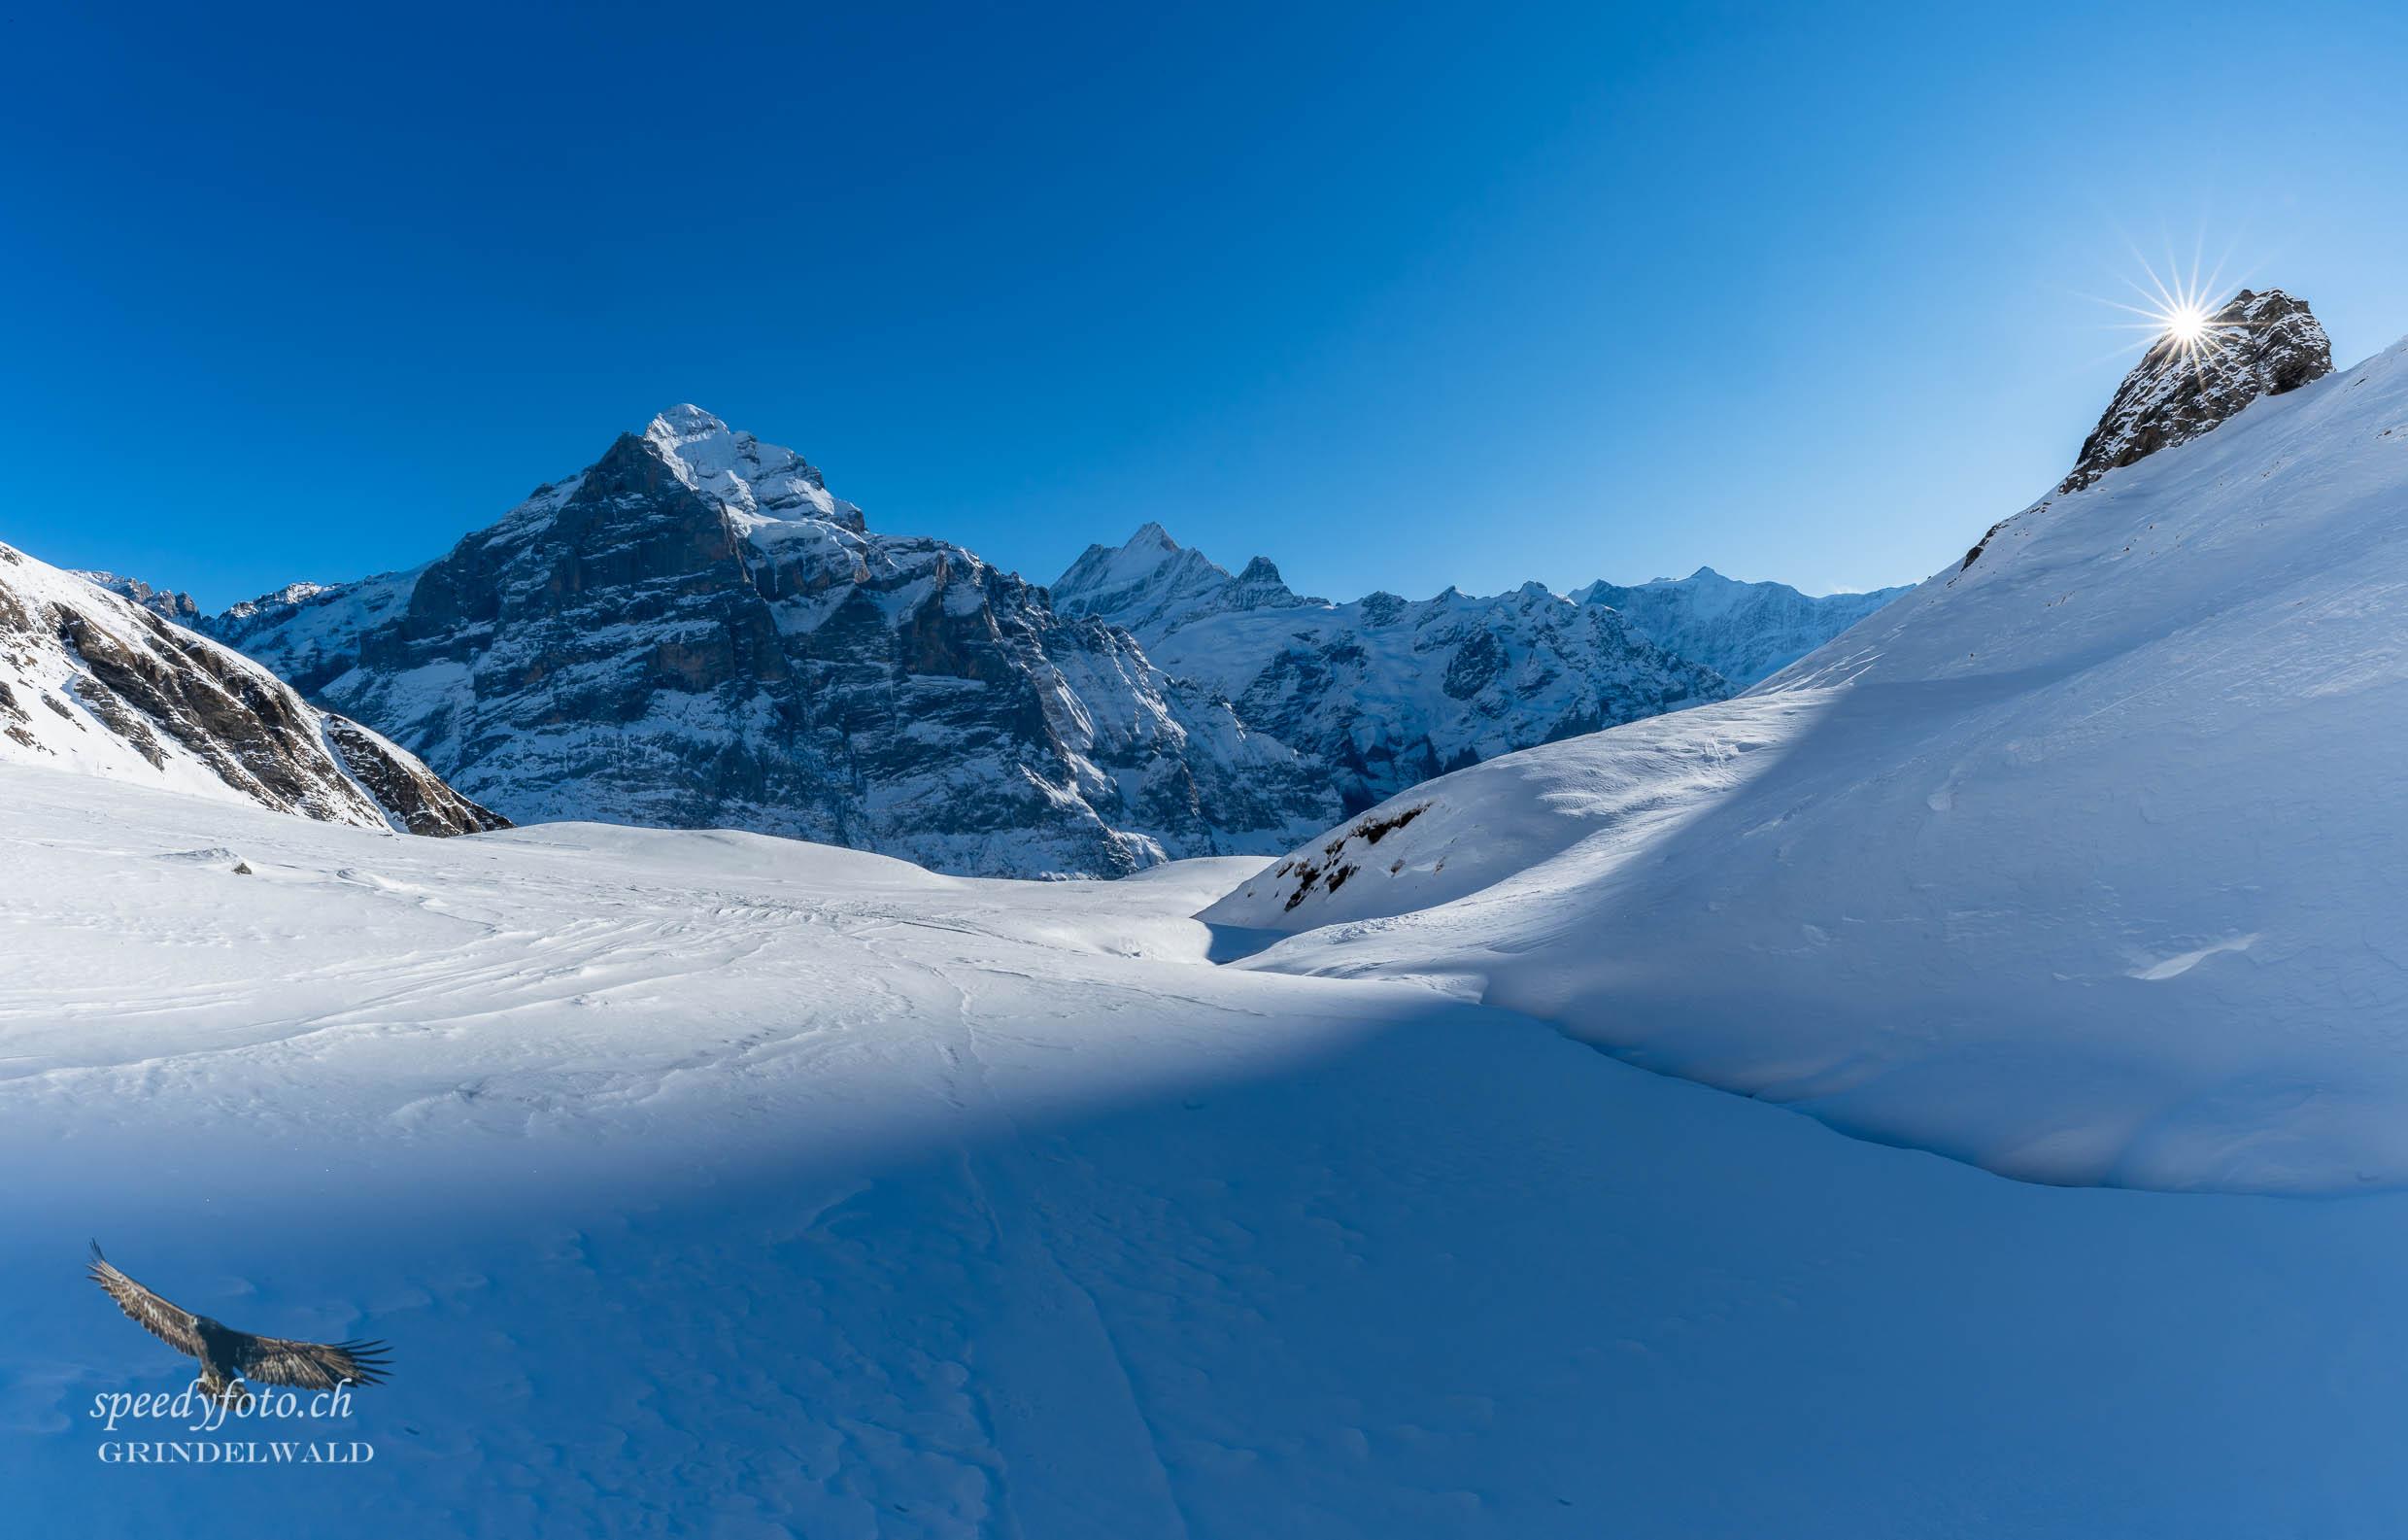 The Skiarea - First